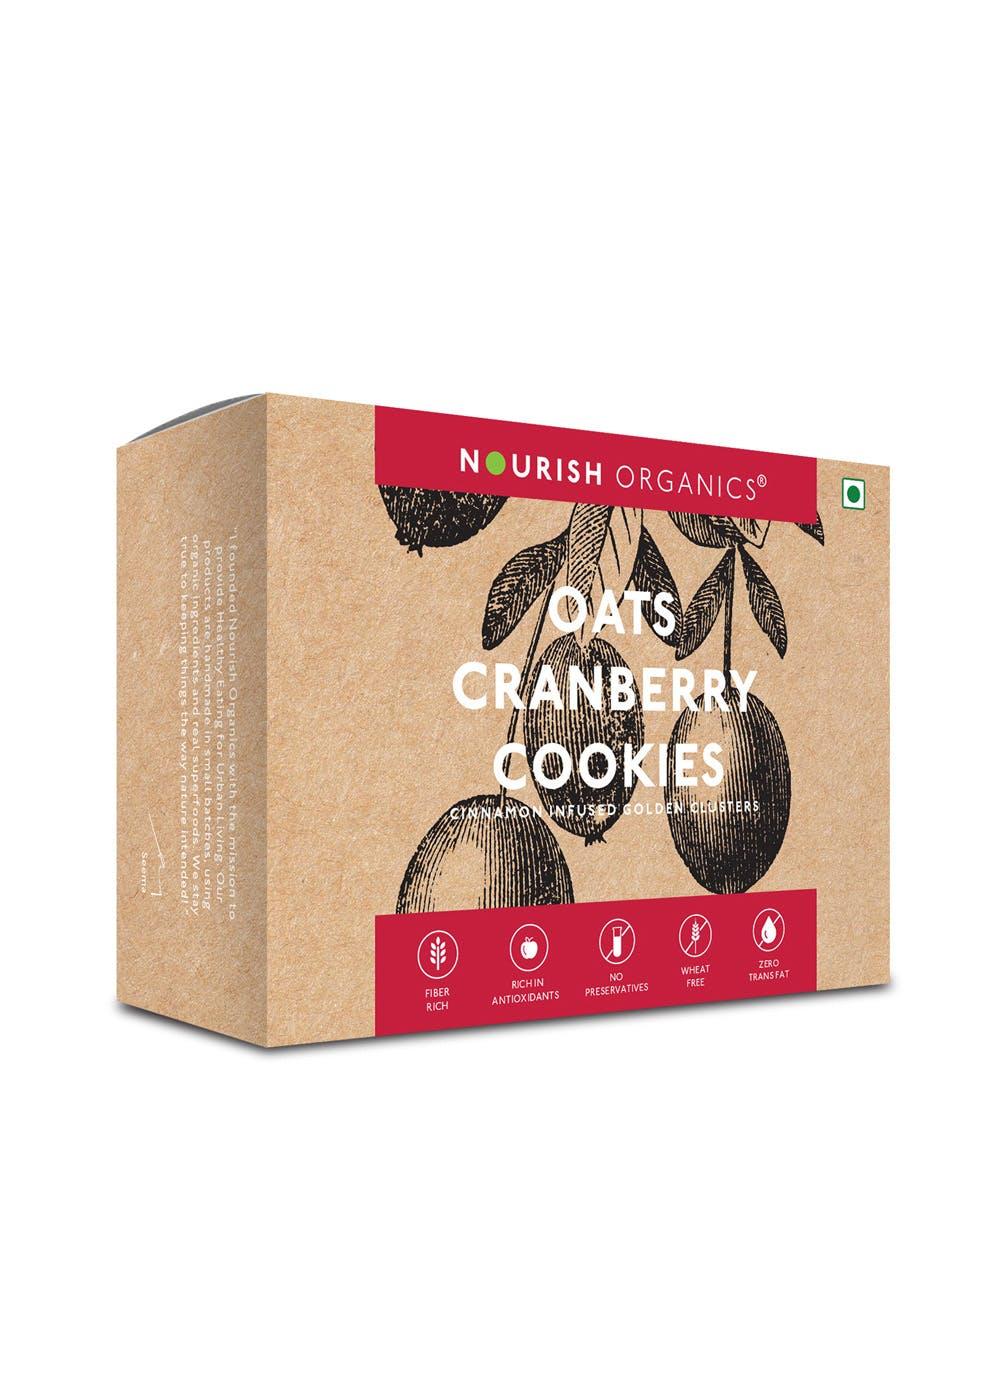 Oats Cranberry Cookies - 130g